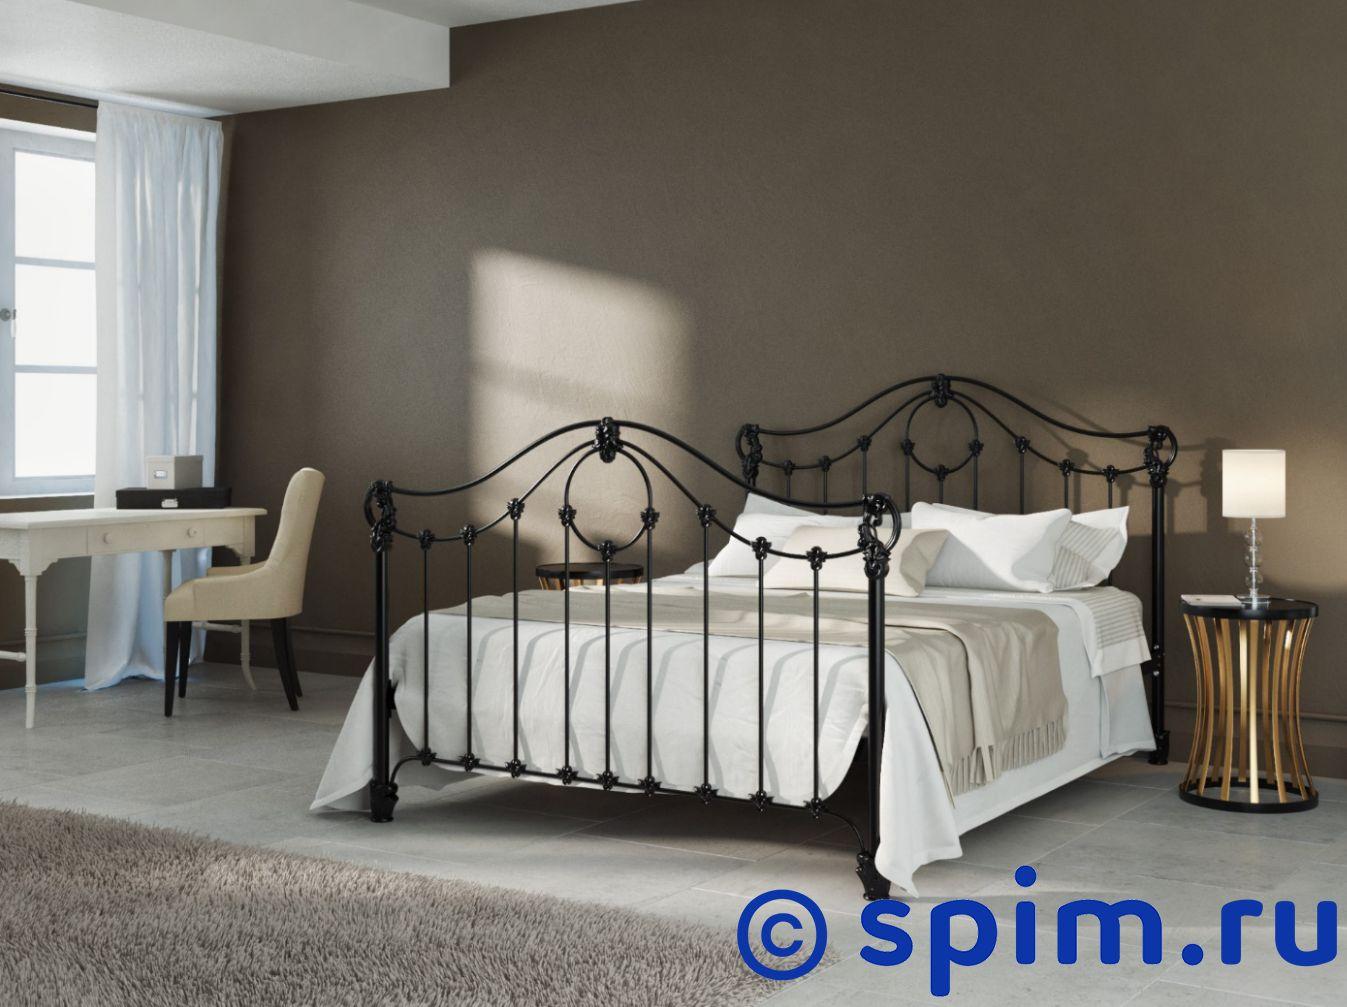 Кровать Originals by Dreamline Sylva (1 спинка) 120х200 см матрас dreamline springless soft slim 90х195 см